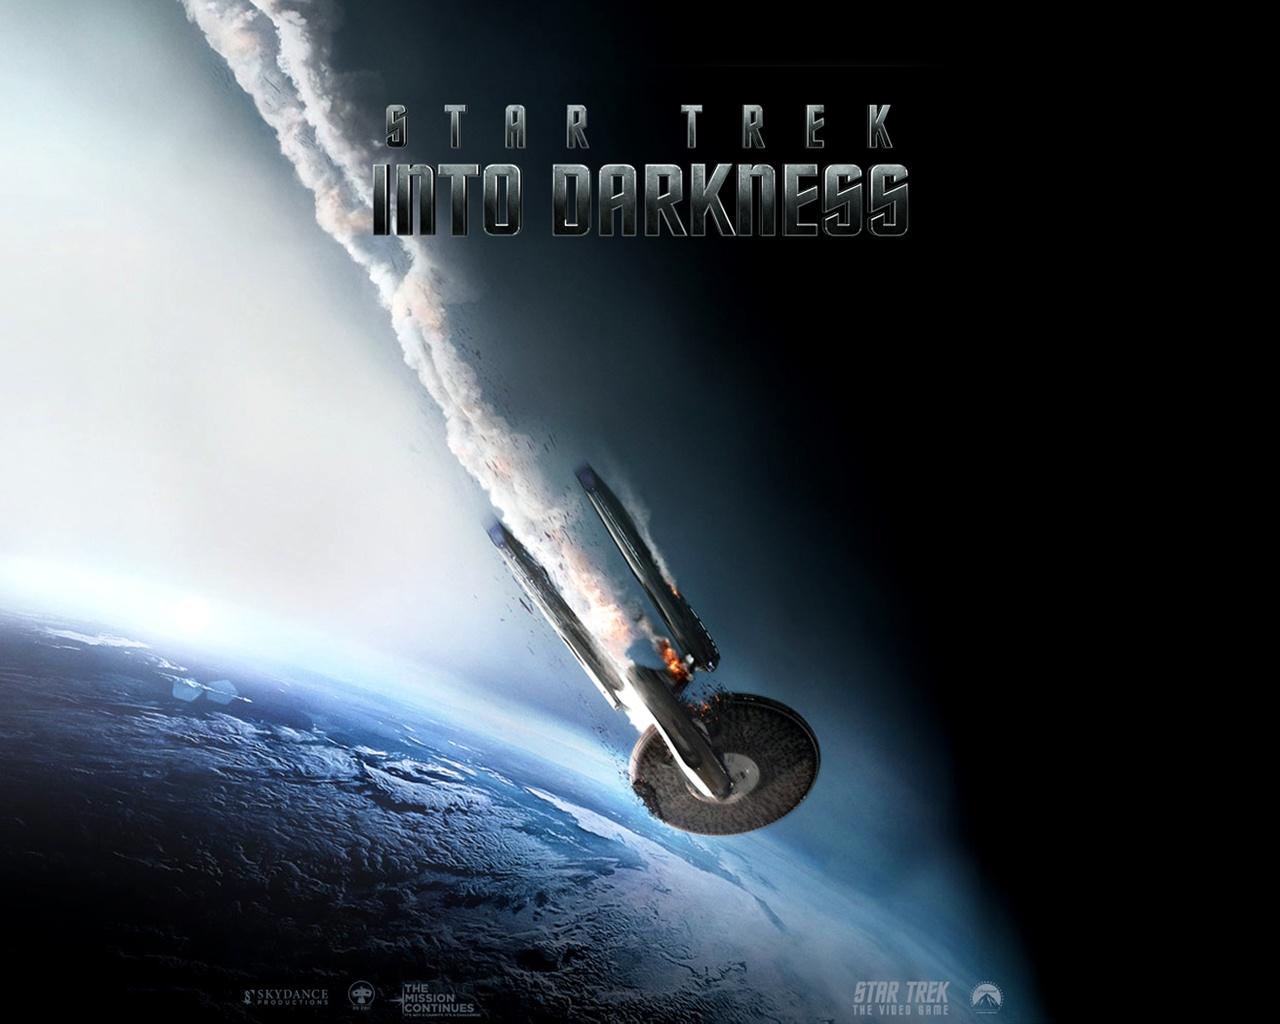 Star Trek Into Darkness Wallpaper - WallpaperSafari